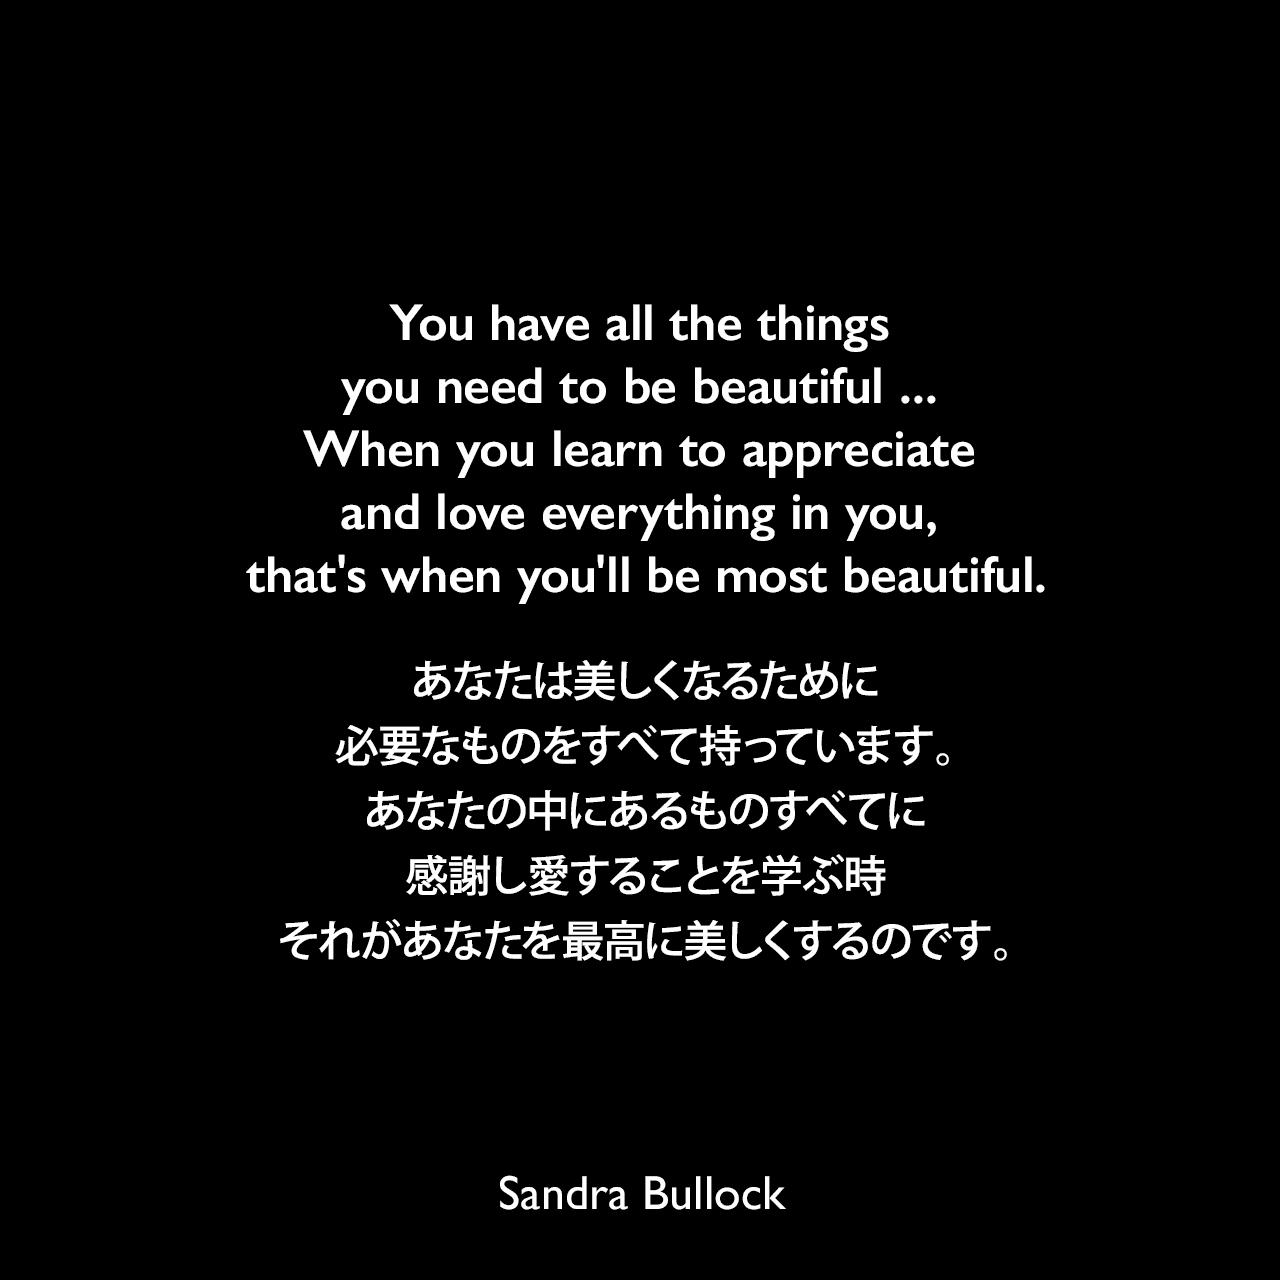 You have all the things you need to be beautiful ... When you learn to appreciate and love everything in you, that's when you'll be most beautiful.あなたは美しくなるために必要なものをすべて持っています。あなたの中にあるものすべてに感謝し愛することを学ぶ時、それがあなたを最高に美しくするのです。Sandra Bullock